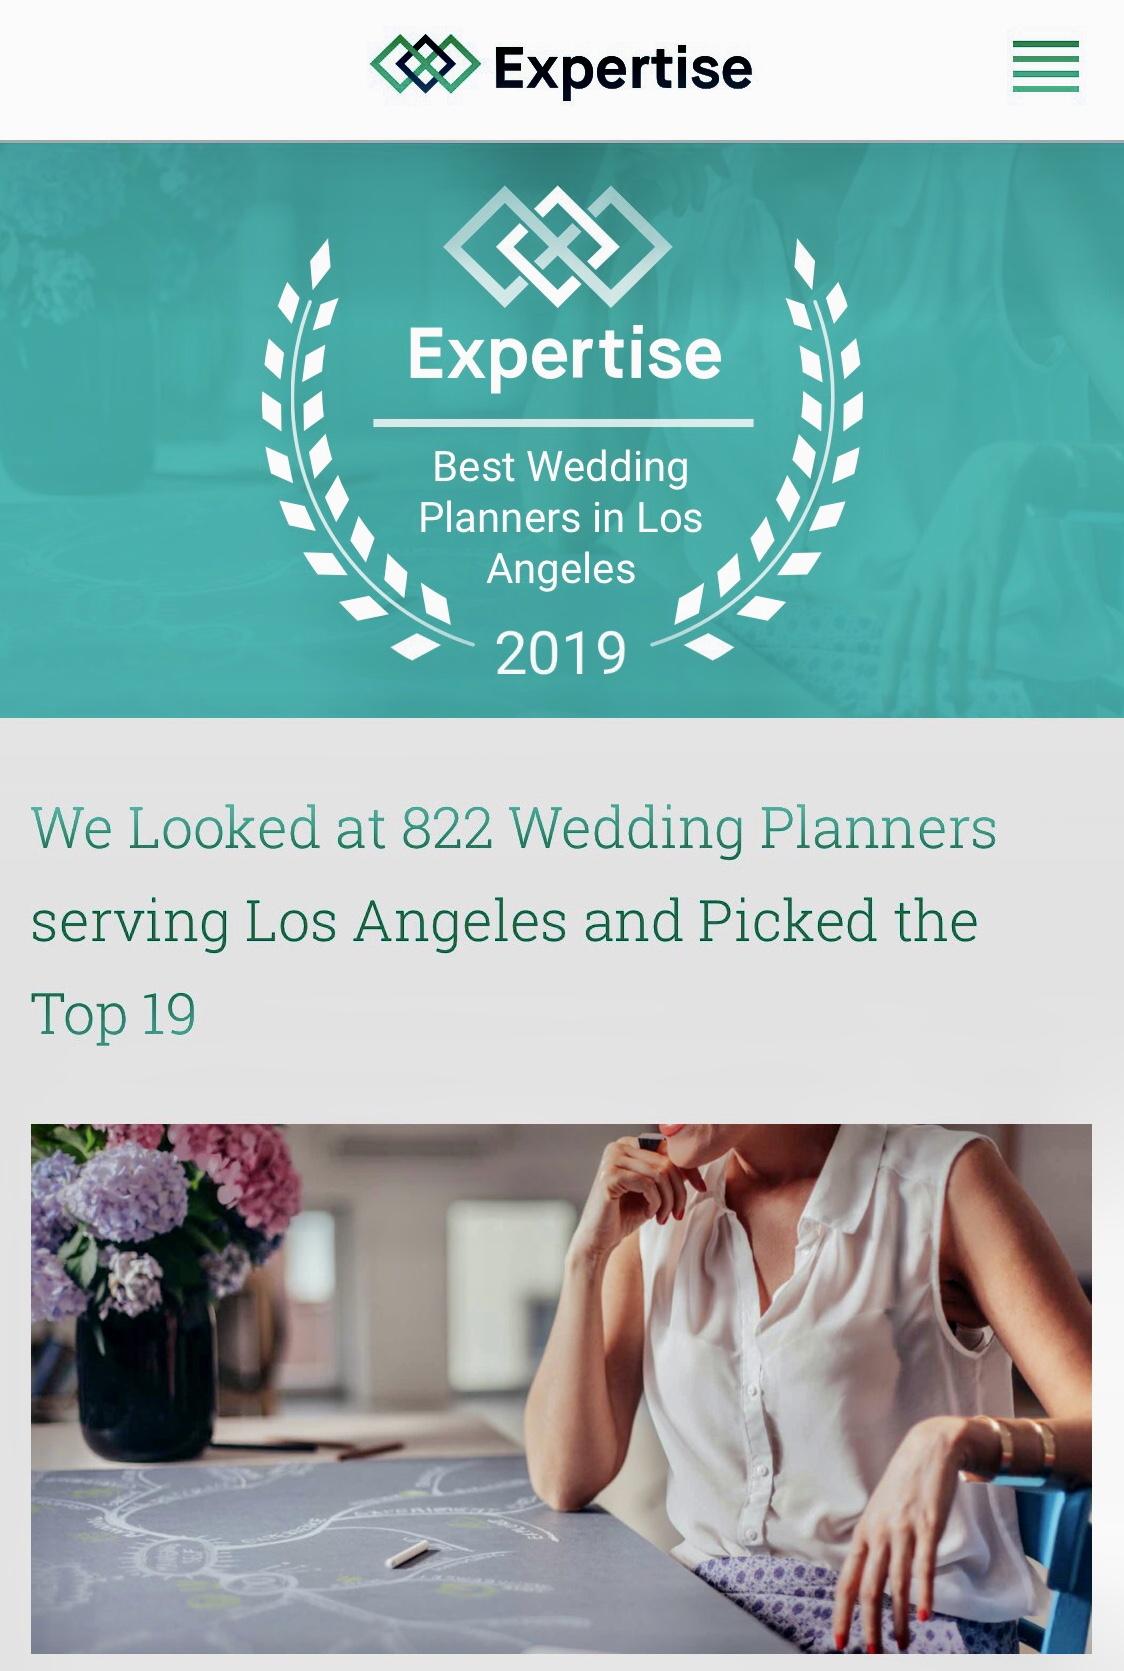 Expertise-2019-Orange-LA-County-Wedding-Planner-Maria-Lindsay